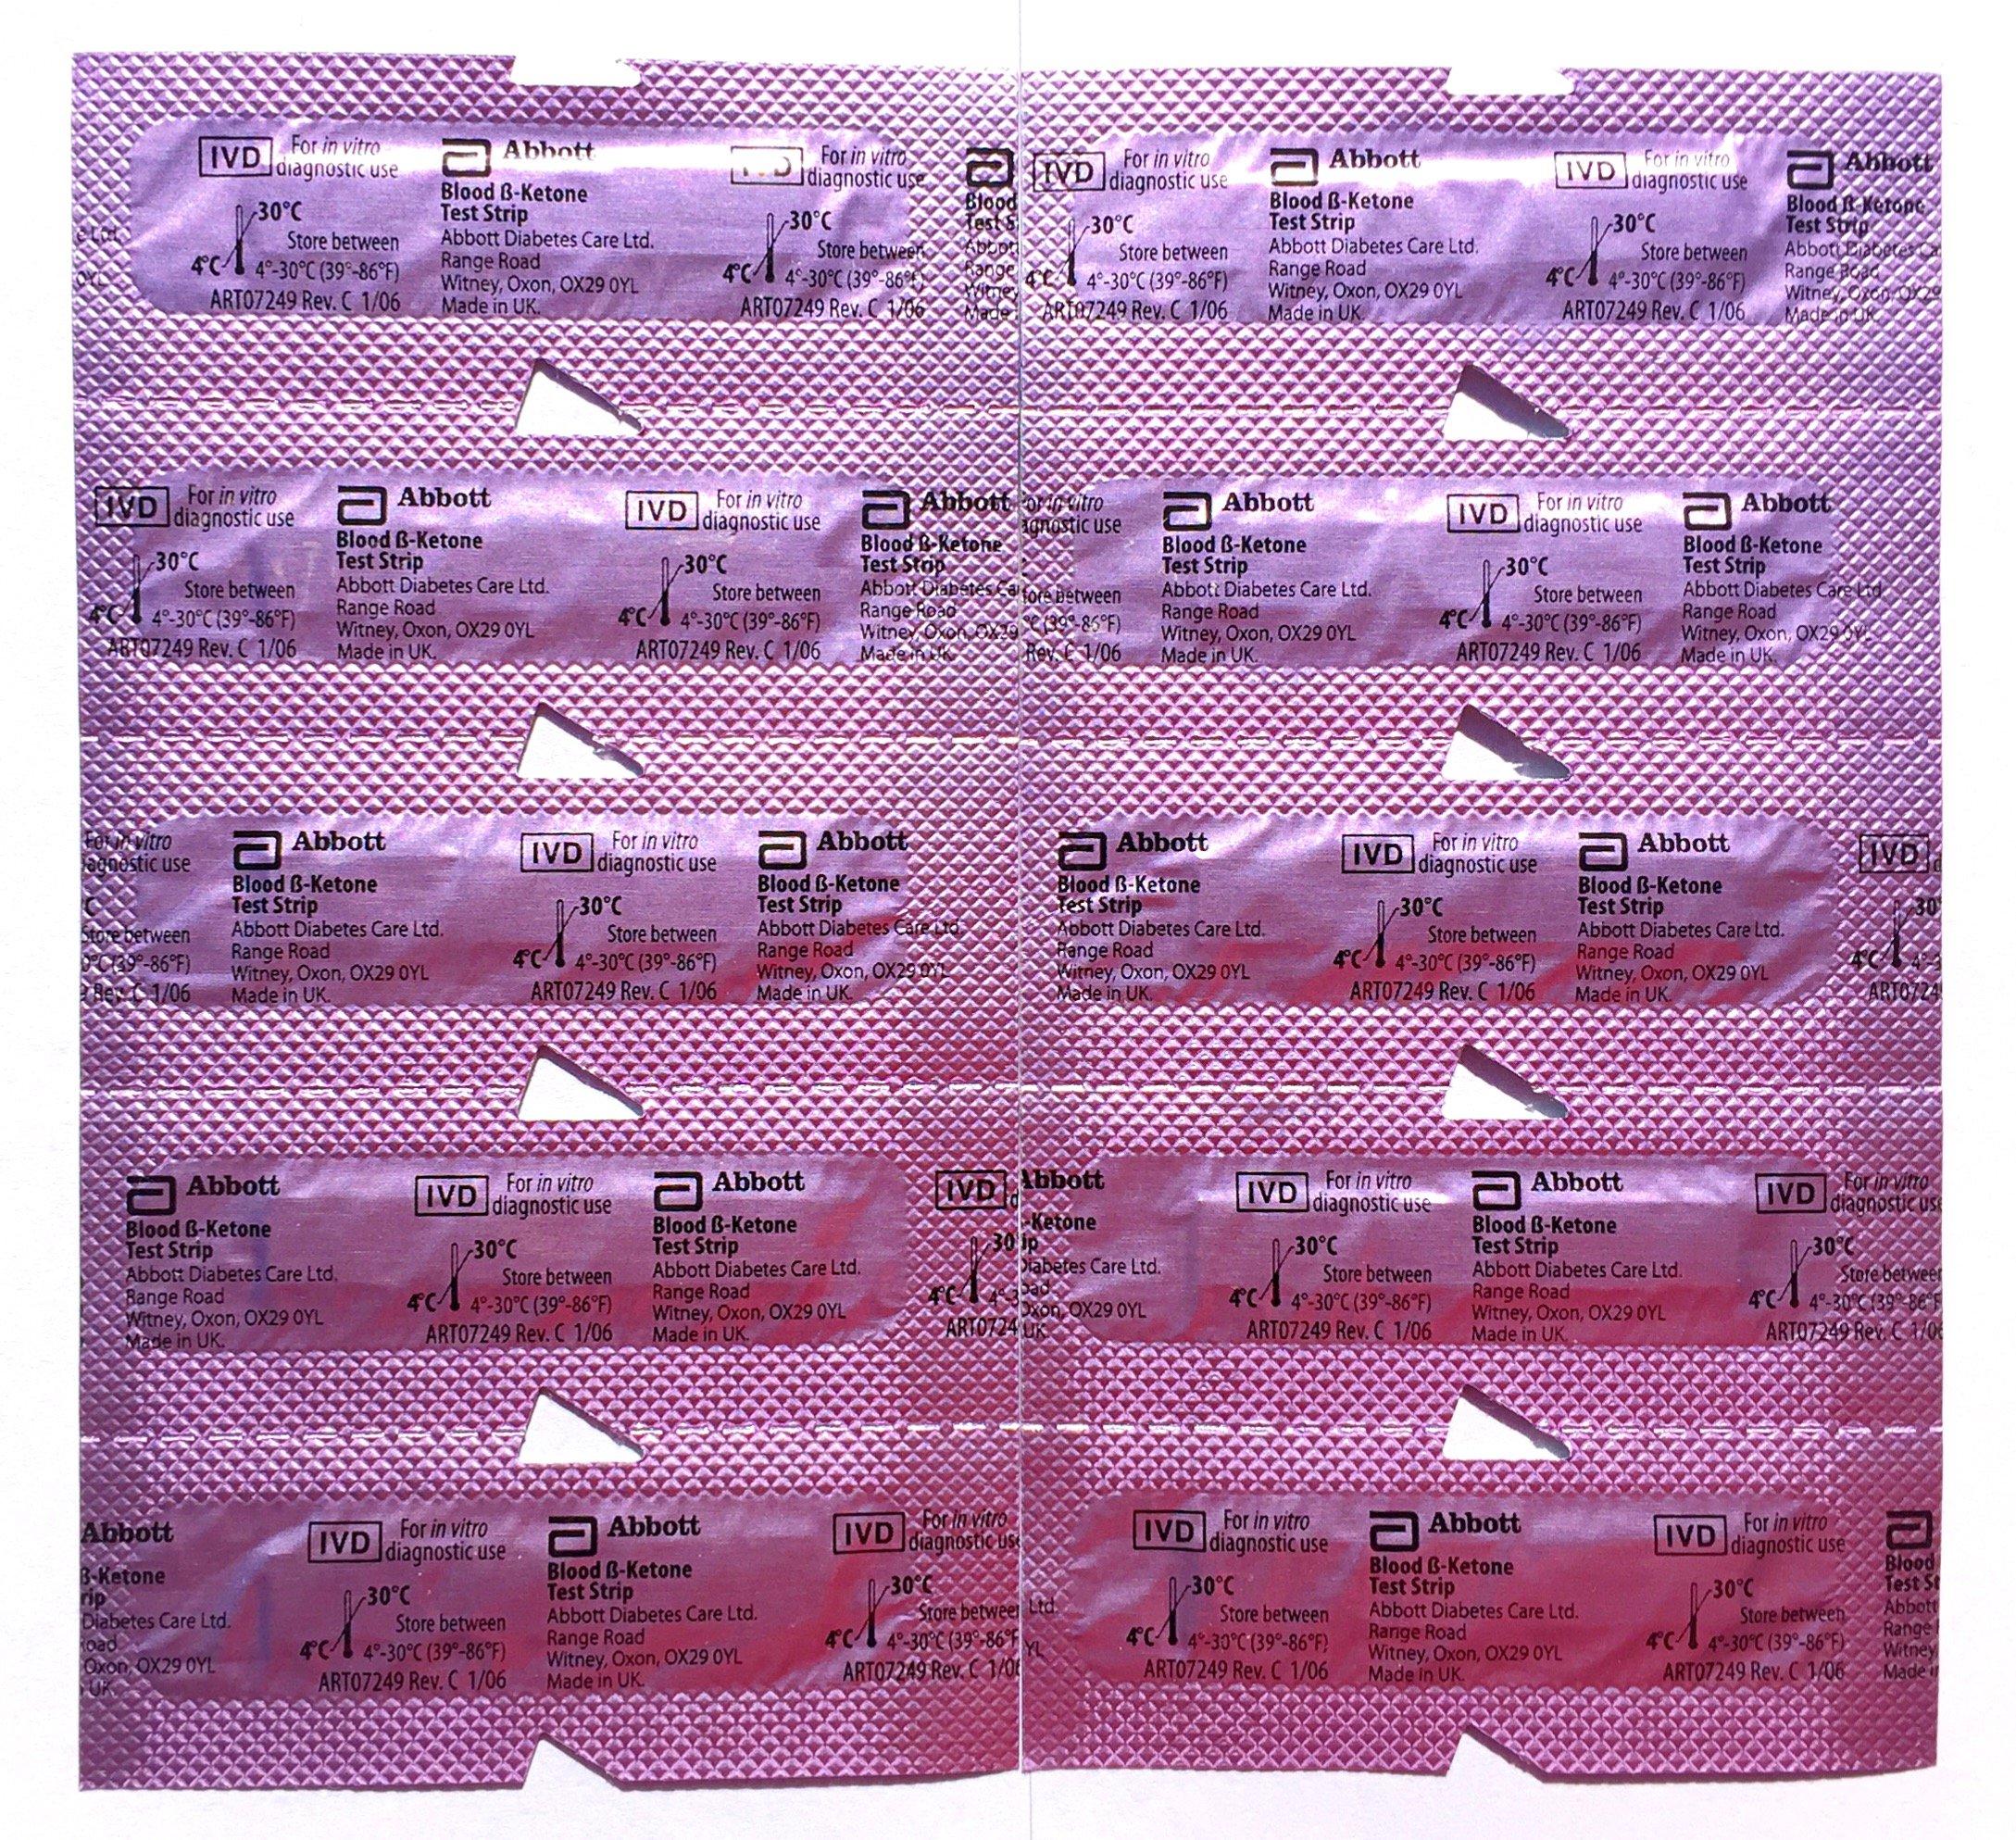 Abbott Precision Xtra Ketone Test Strips - 10 Ea Strips Unboxed